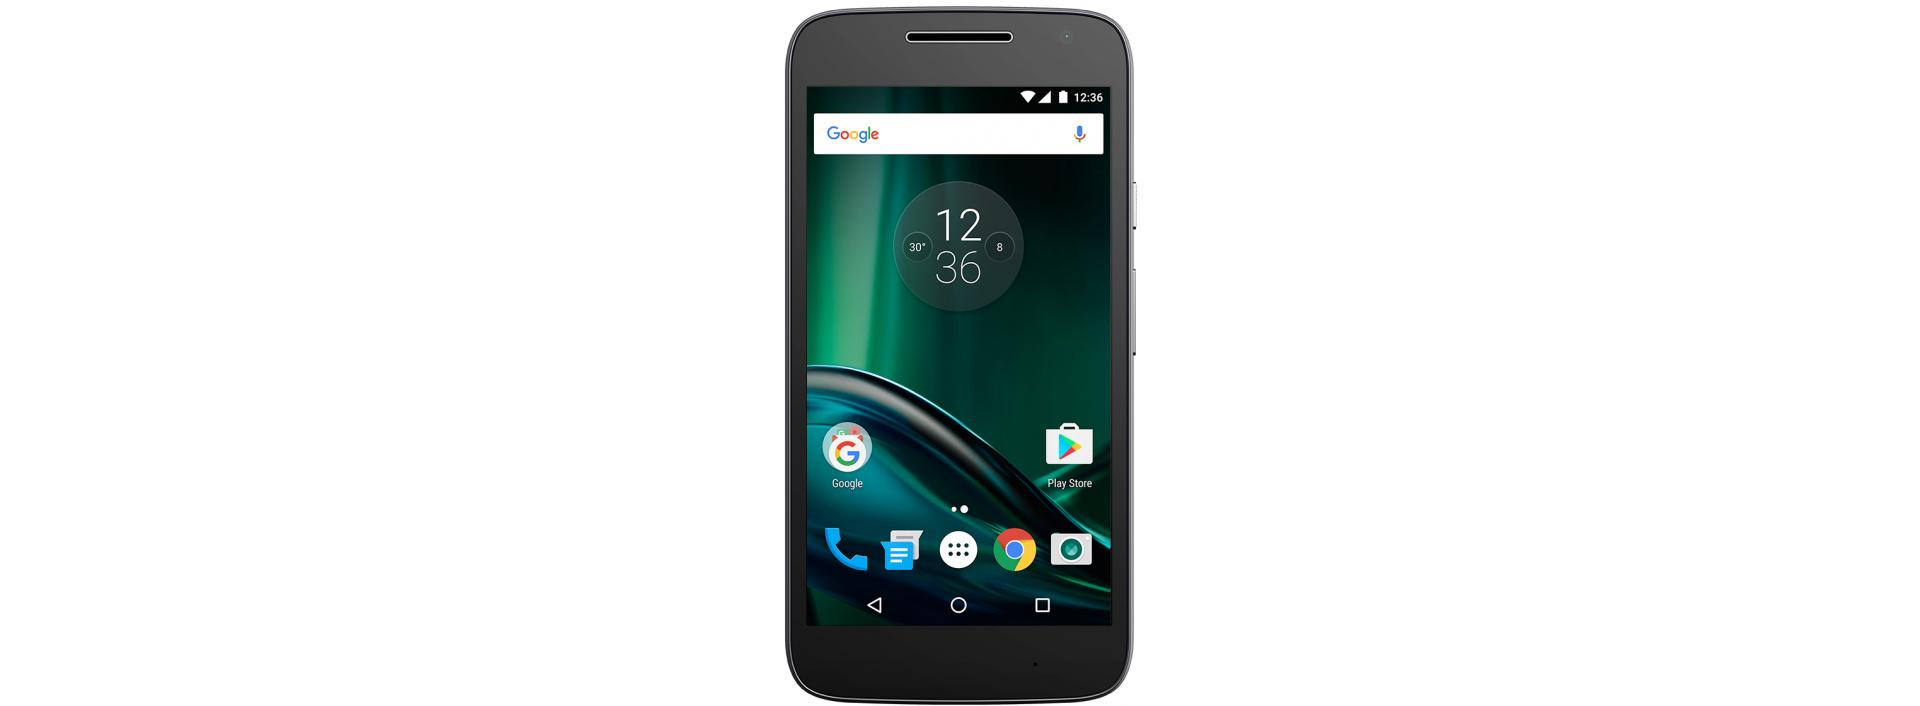 Funda para Moto G4 Play